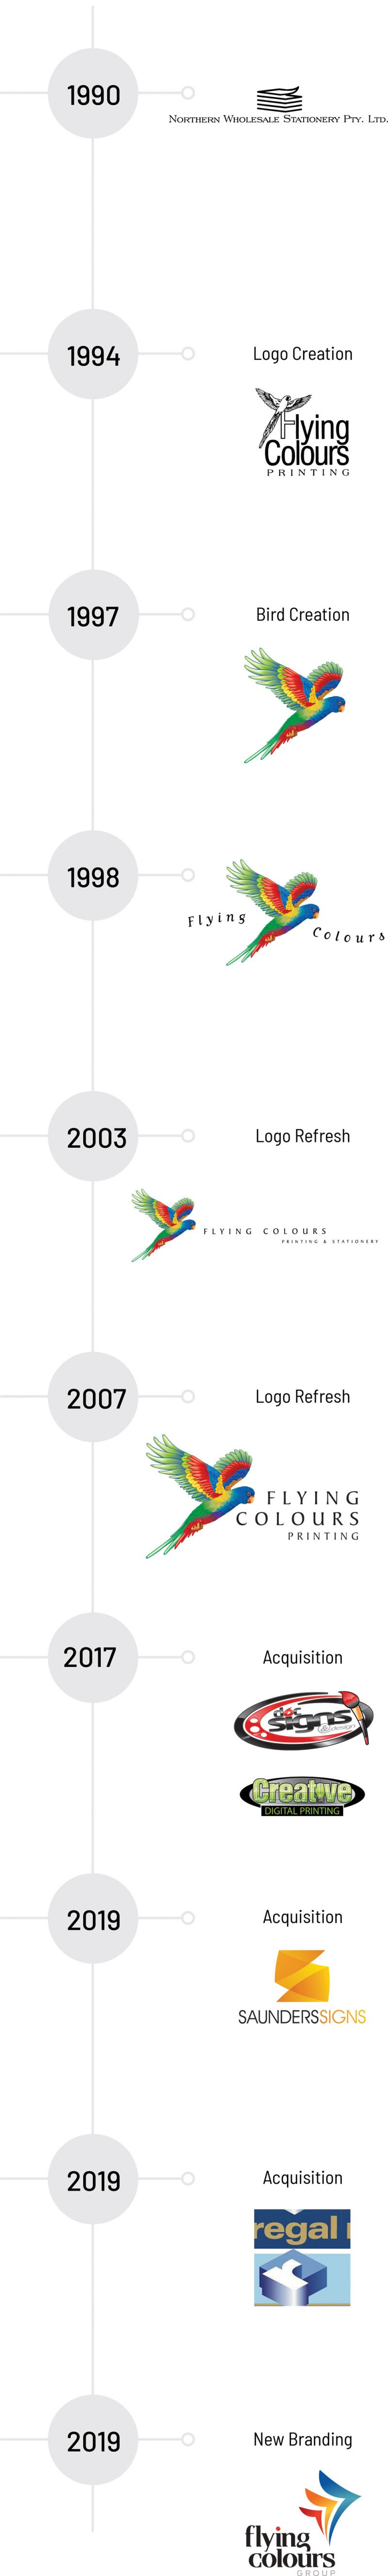 Flying Colours Timeline